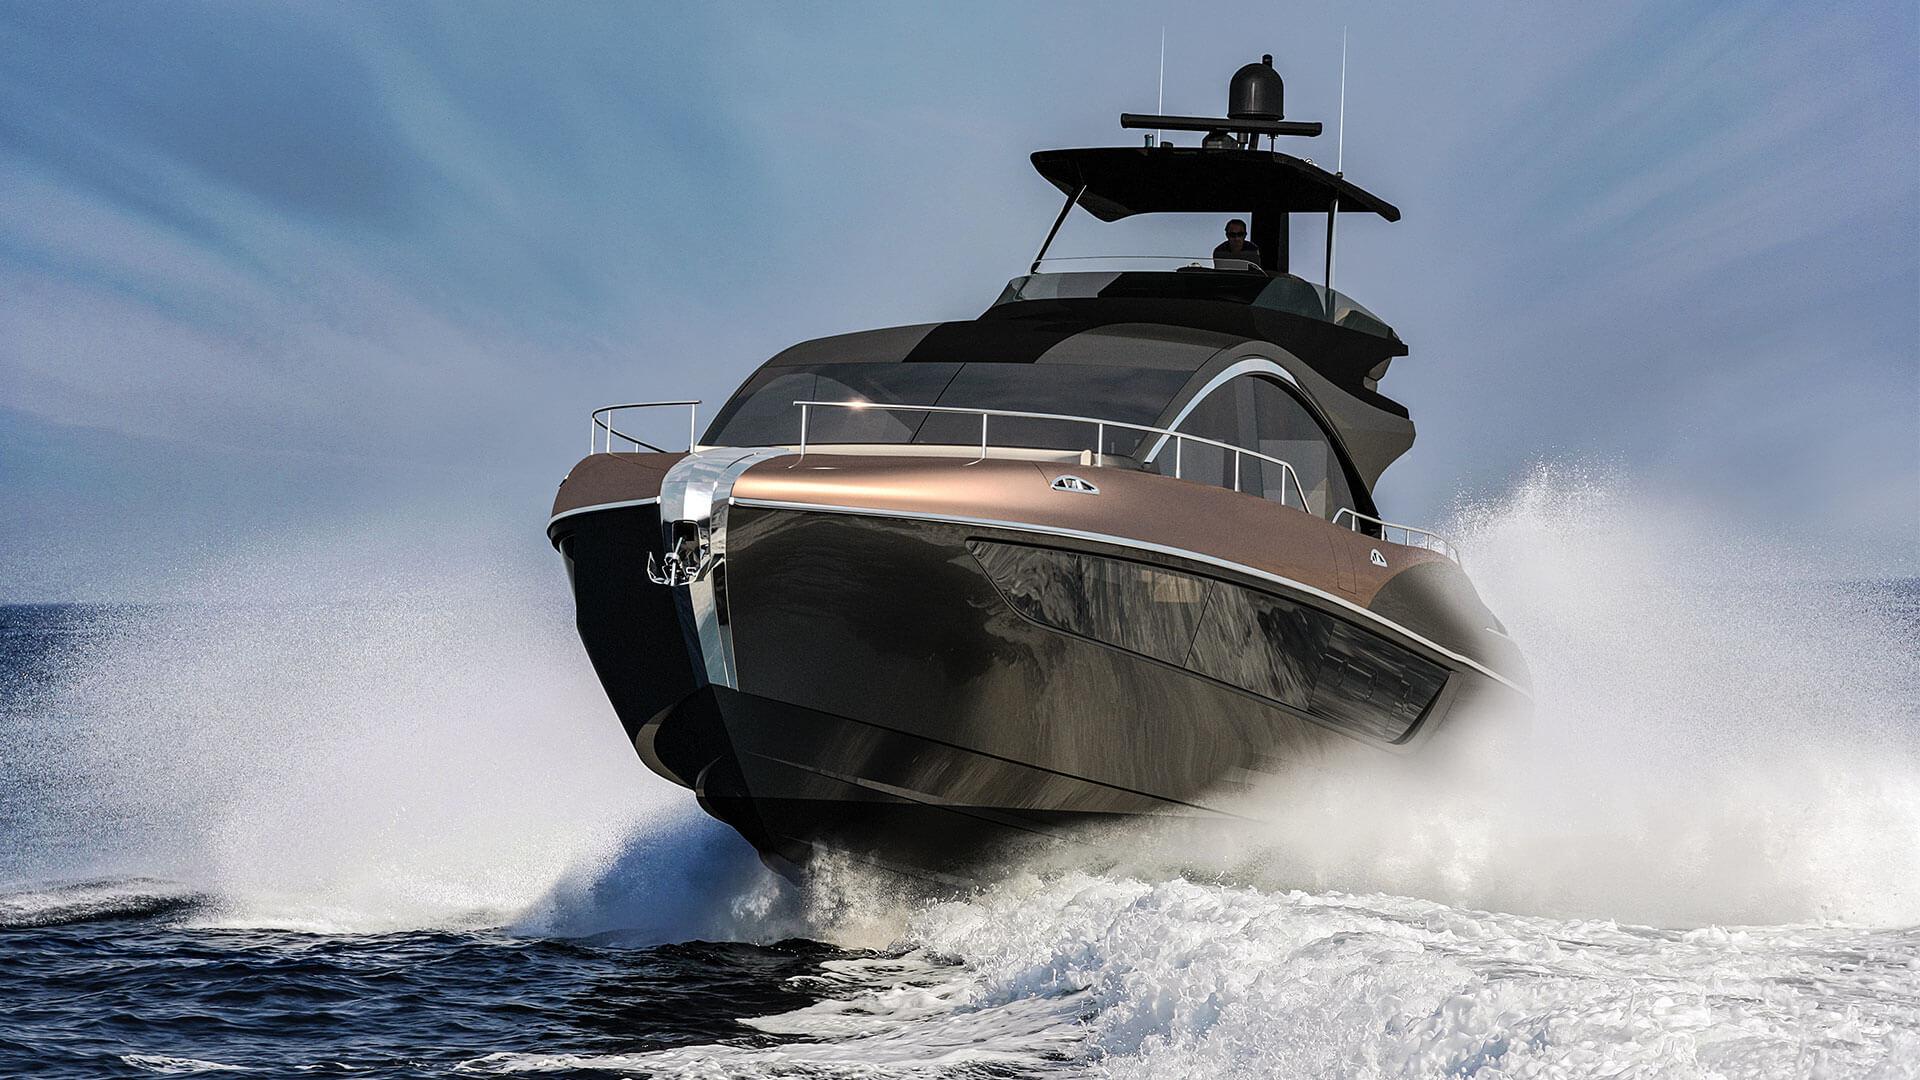 2019 lexus ly 650 luxury yacht hero